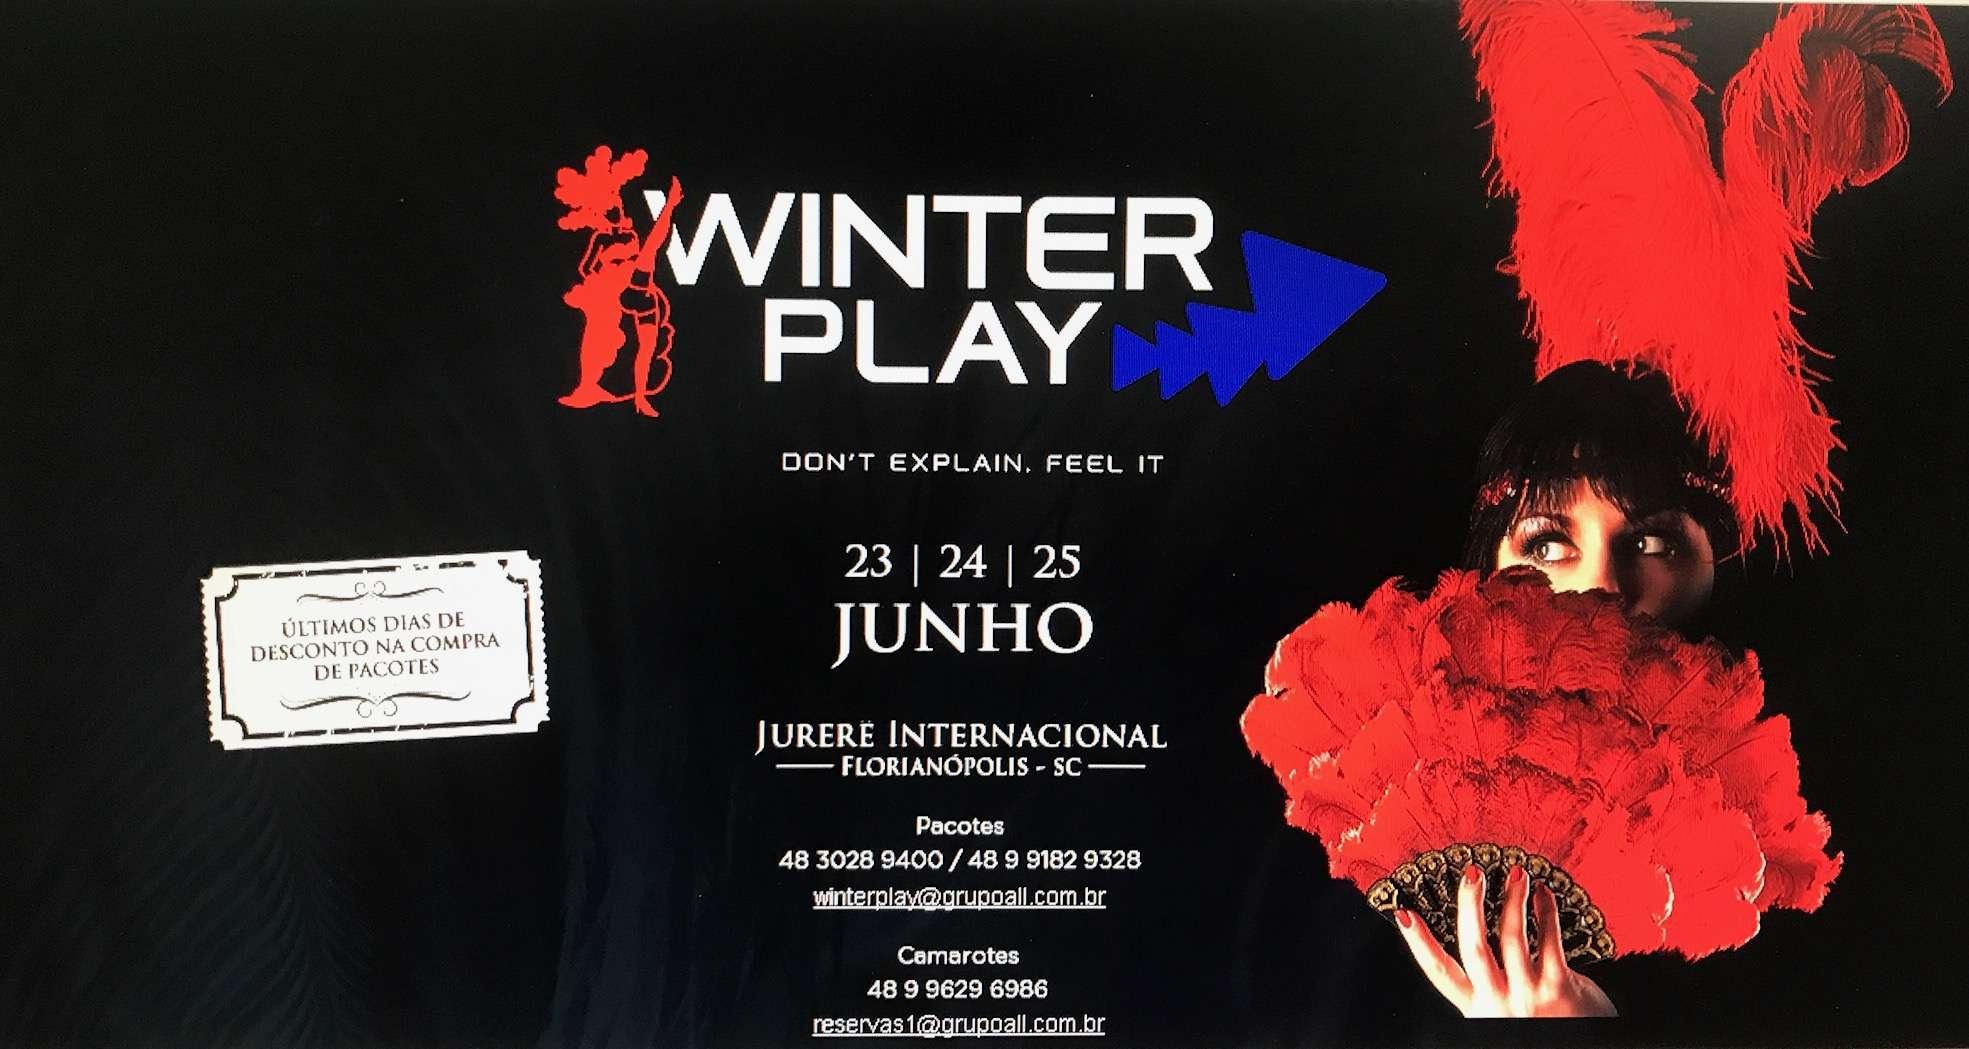 Winter Play 2017 - Jurere Internacional - Florianopolis - SC 1